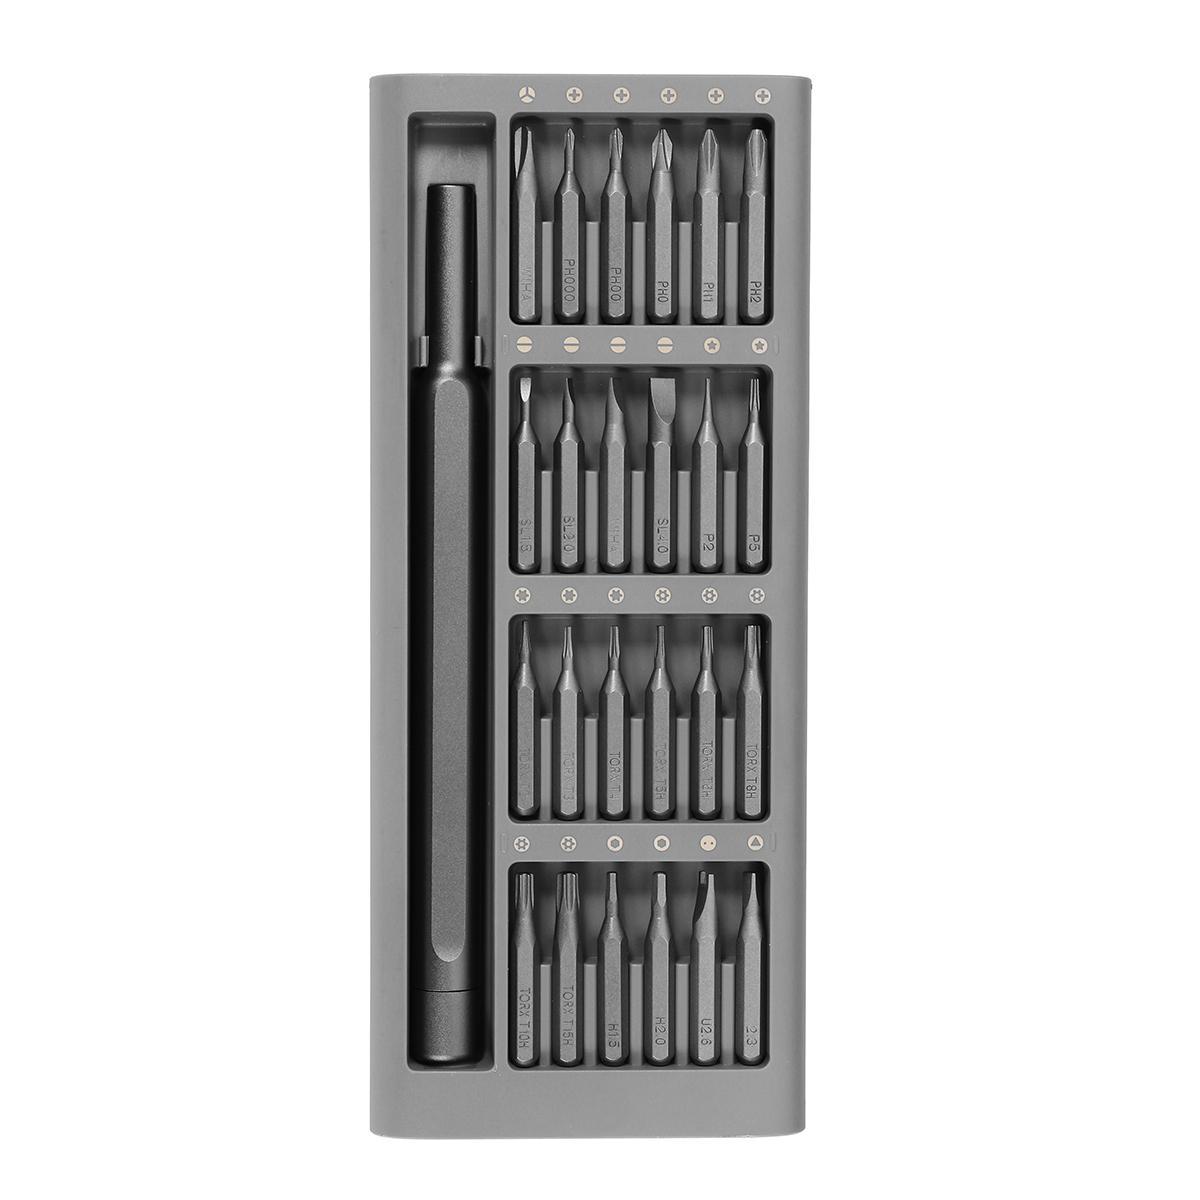 XIAOMI Wiha 25 in 1 Mehrzweck Präzision-Schraubendreher-Satz, Reparatur Set